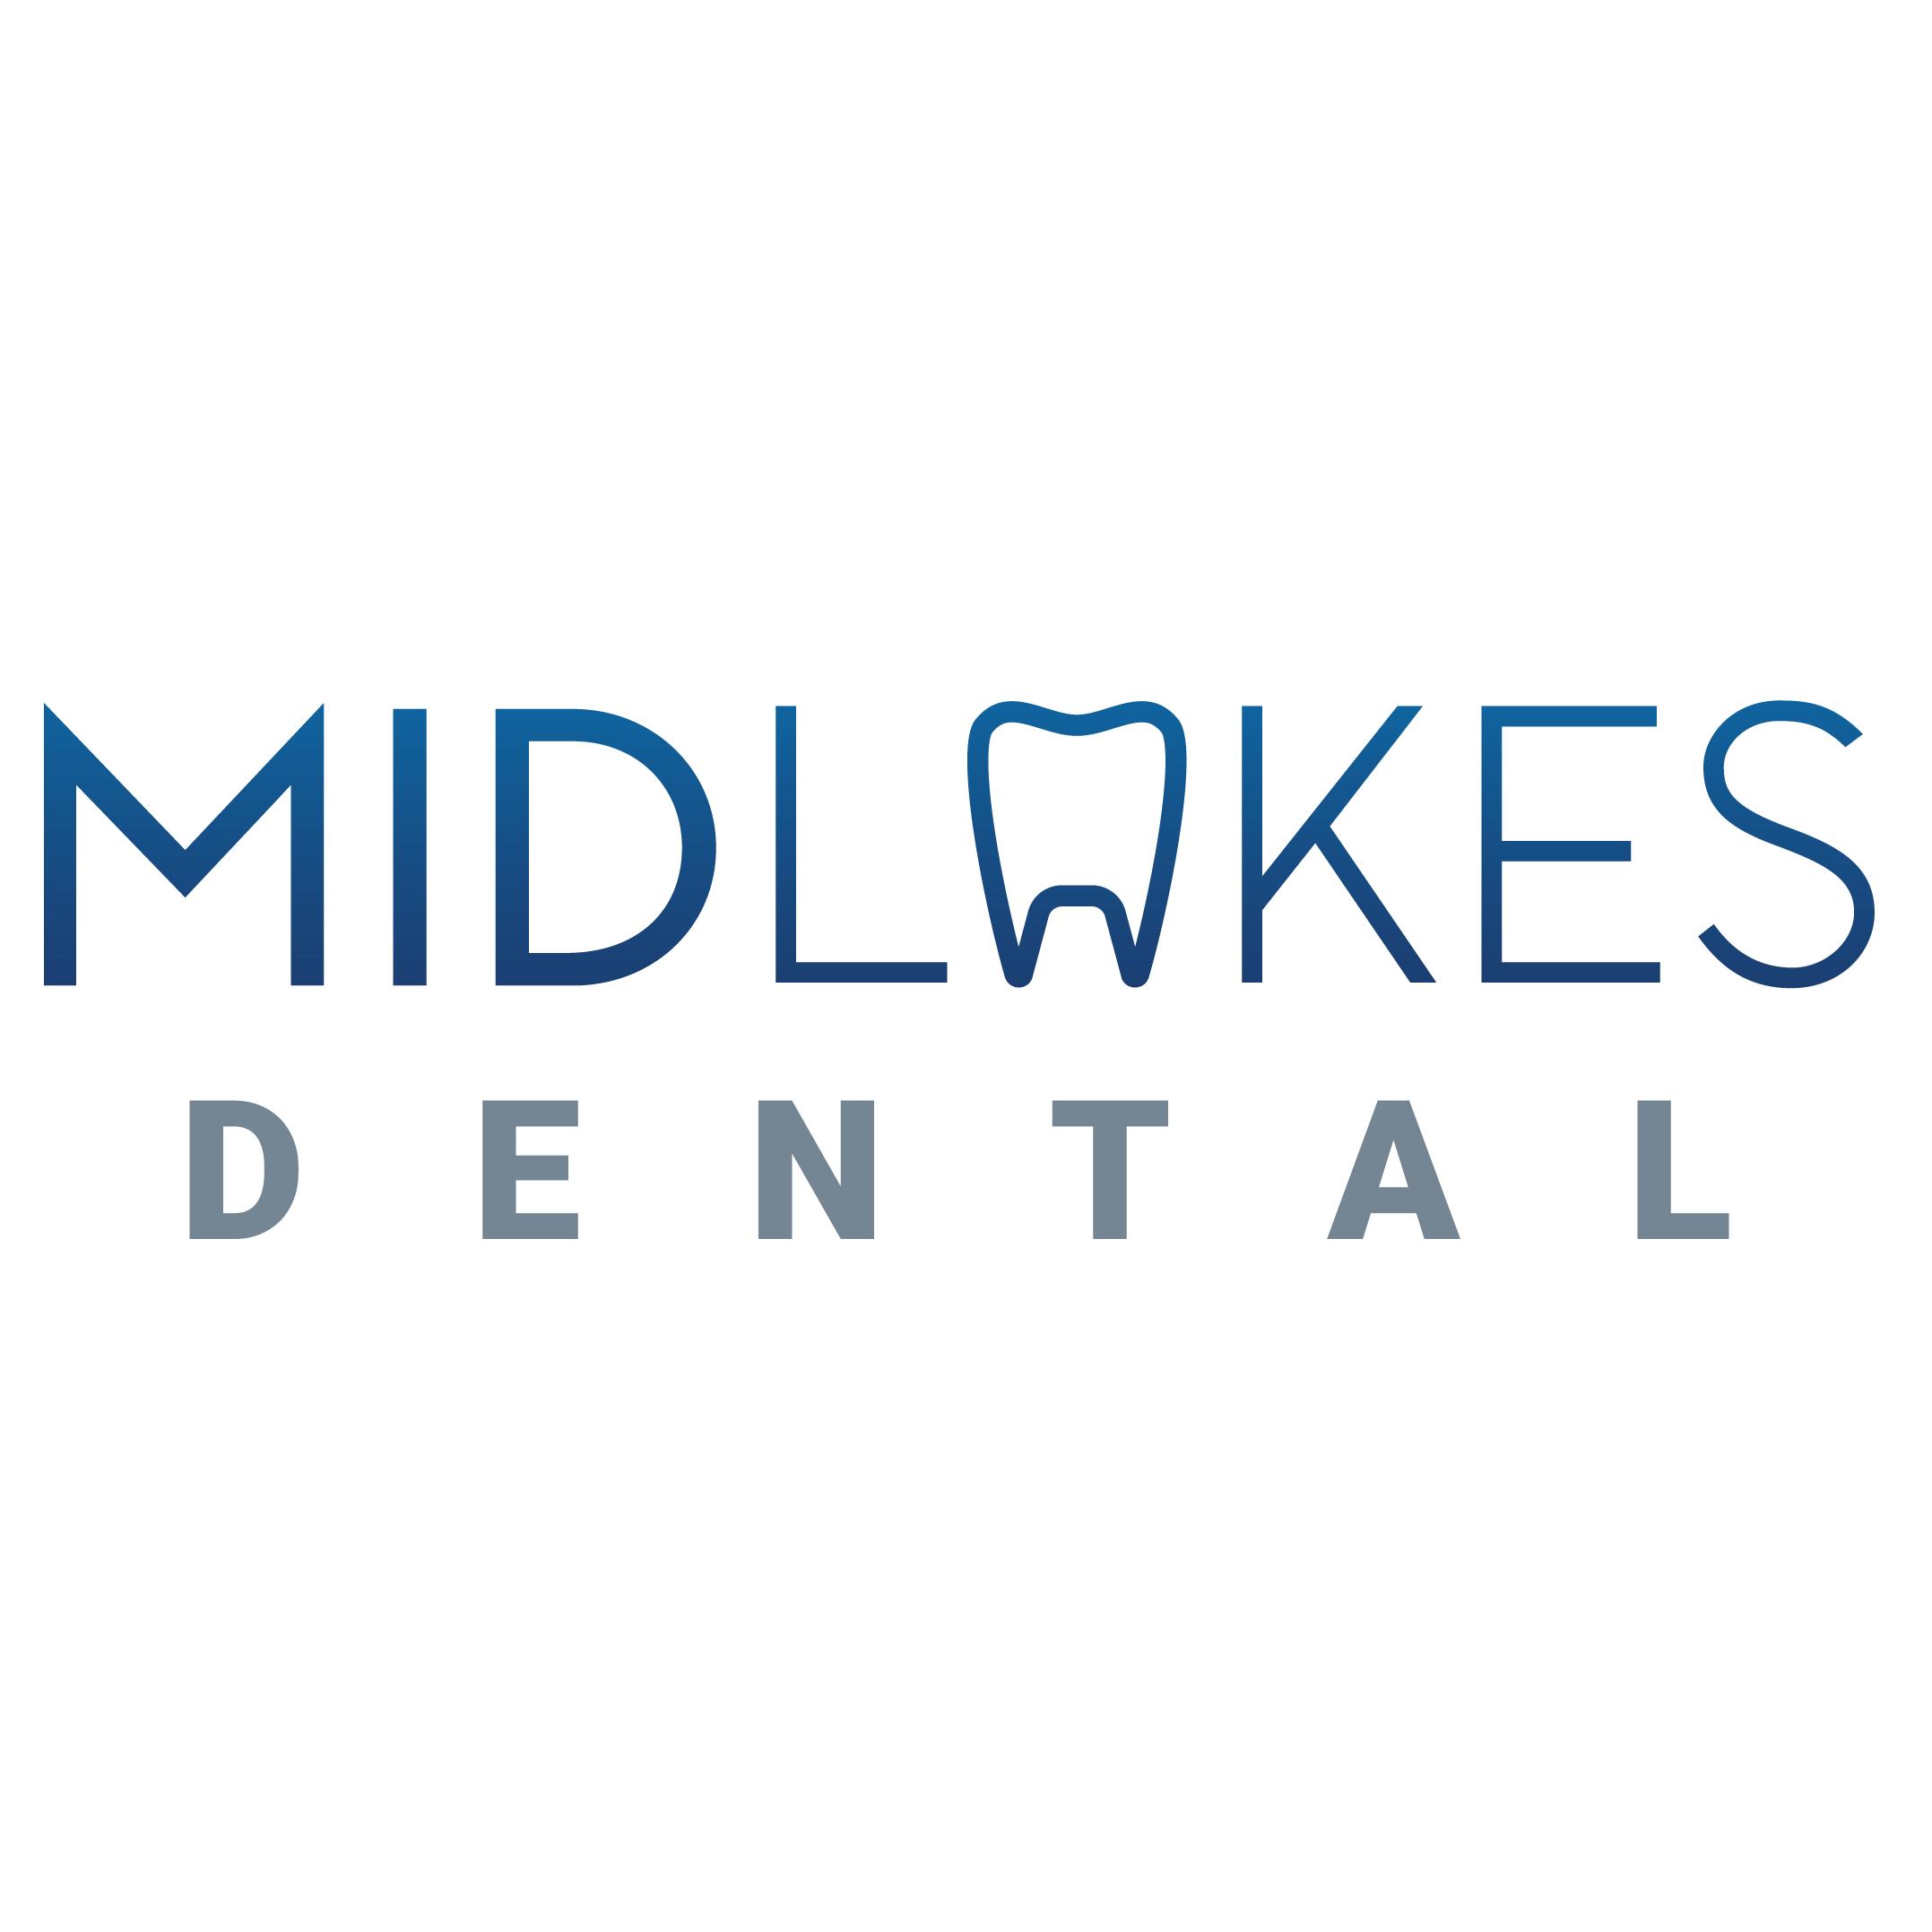 Midlakes Dental - Stanley, NC 28164 - (704)827-4396 | ShowMeLocal.com